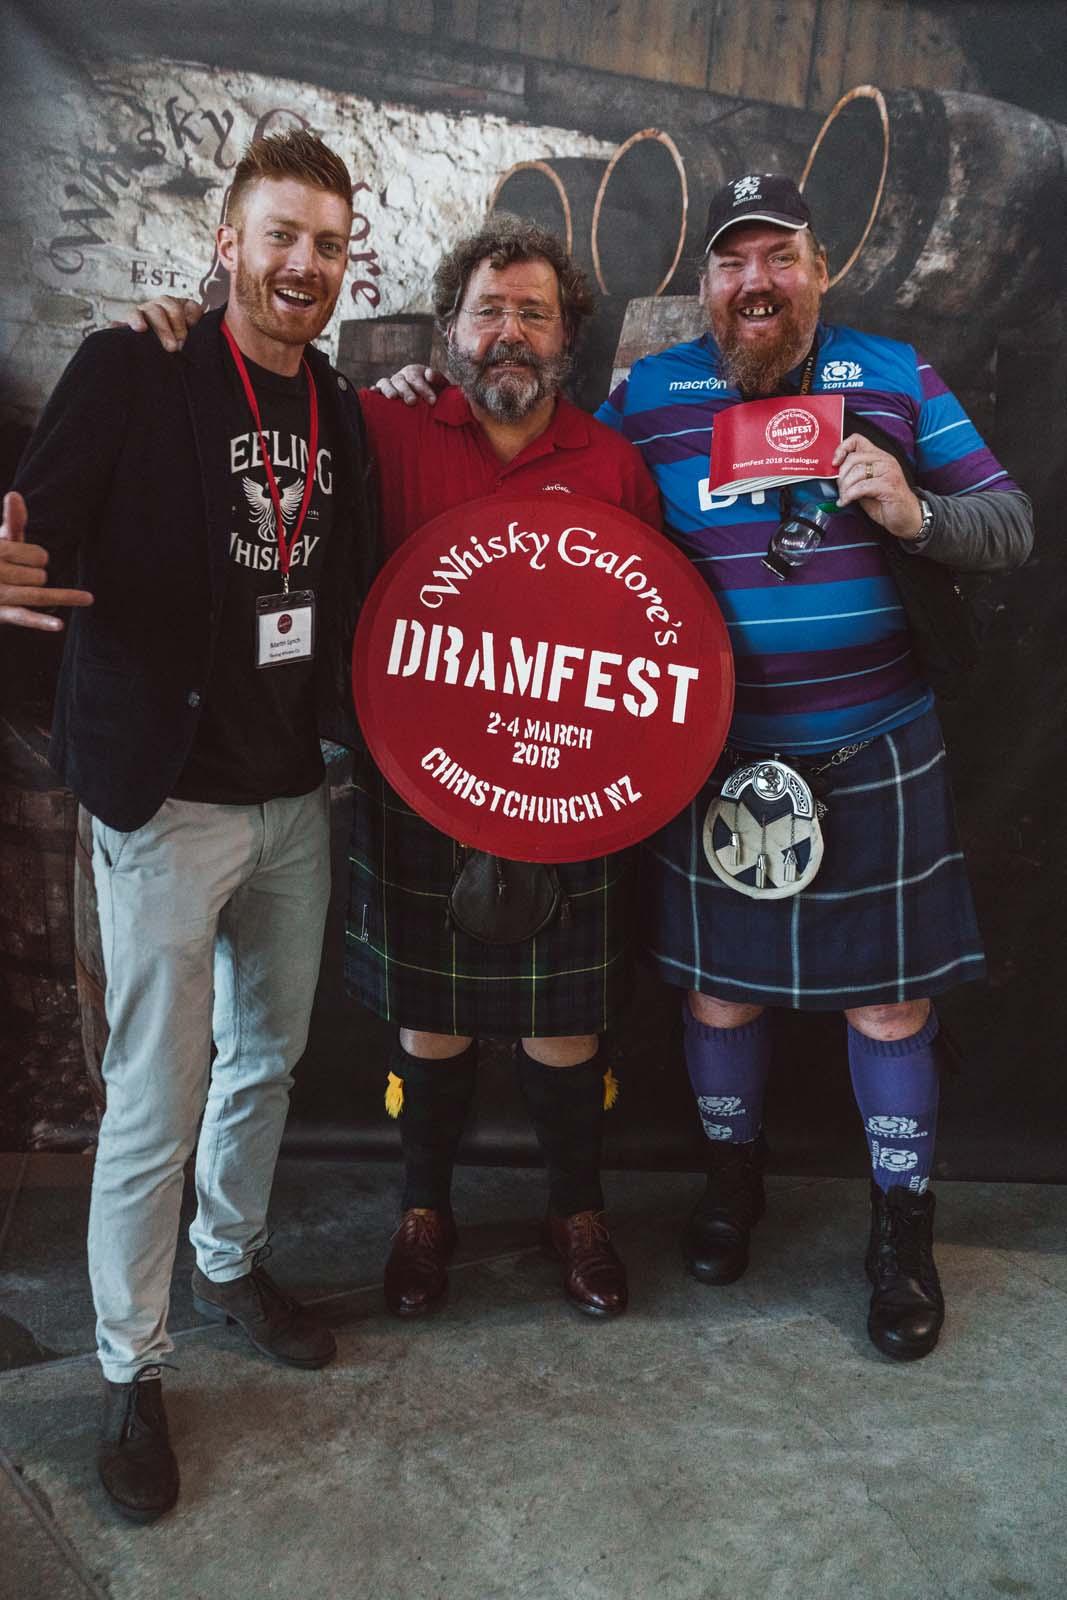 Dramfest 2018 for Whisky Galore-102.jpg